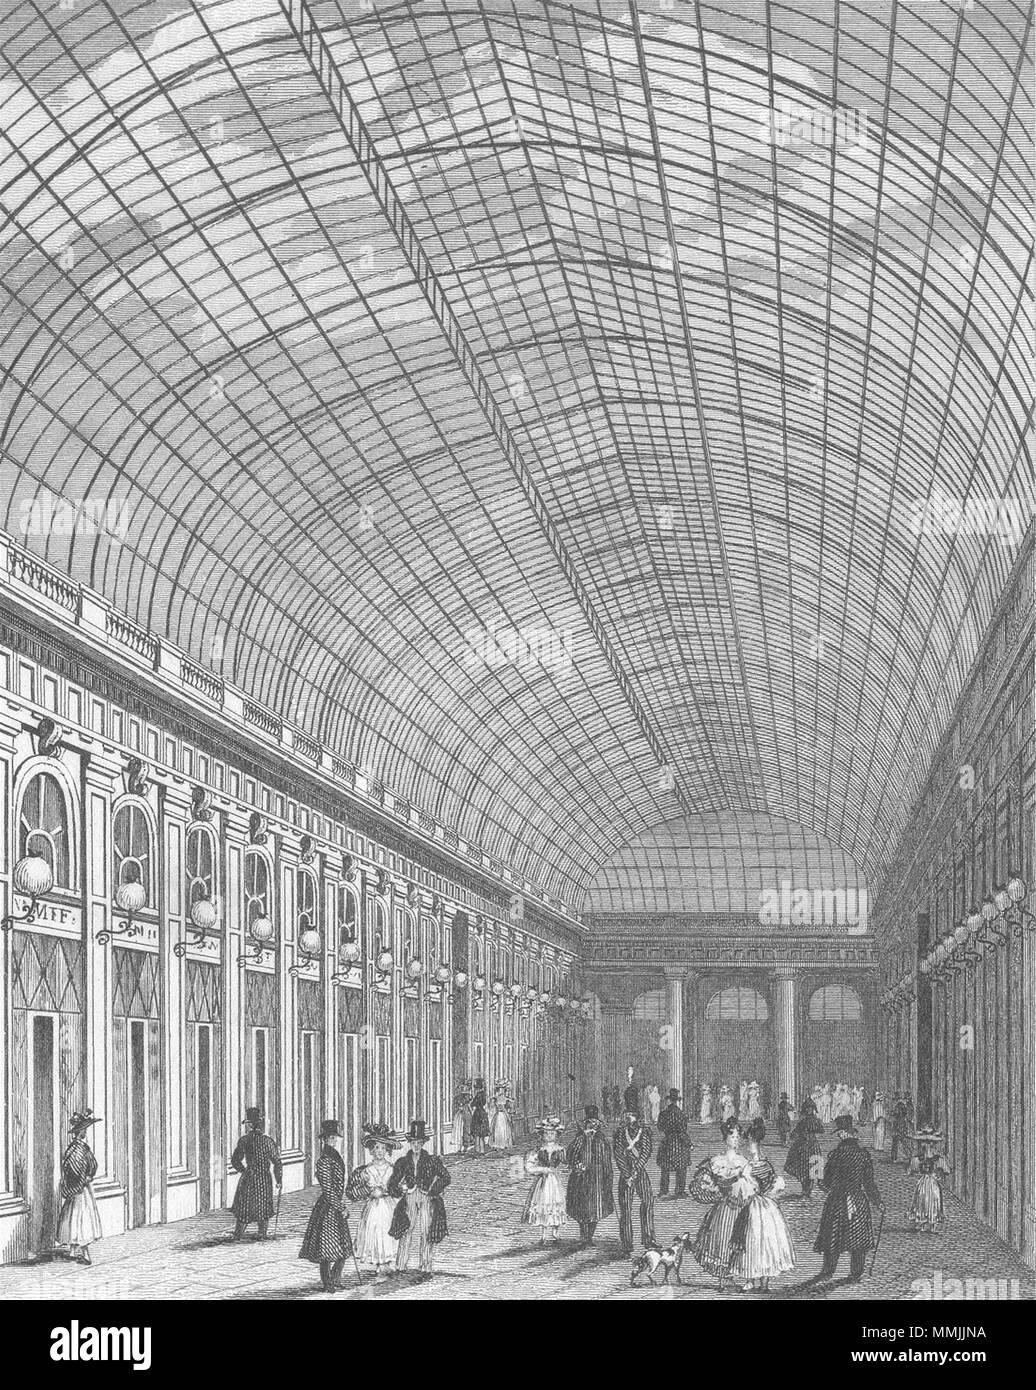 PARIS. Galerie Palais Royal. Hund 1828 alte antike vintage Bild drucken Stockbild